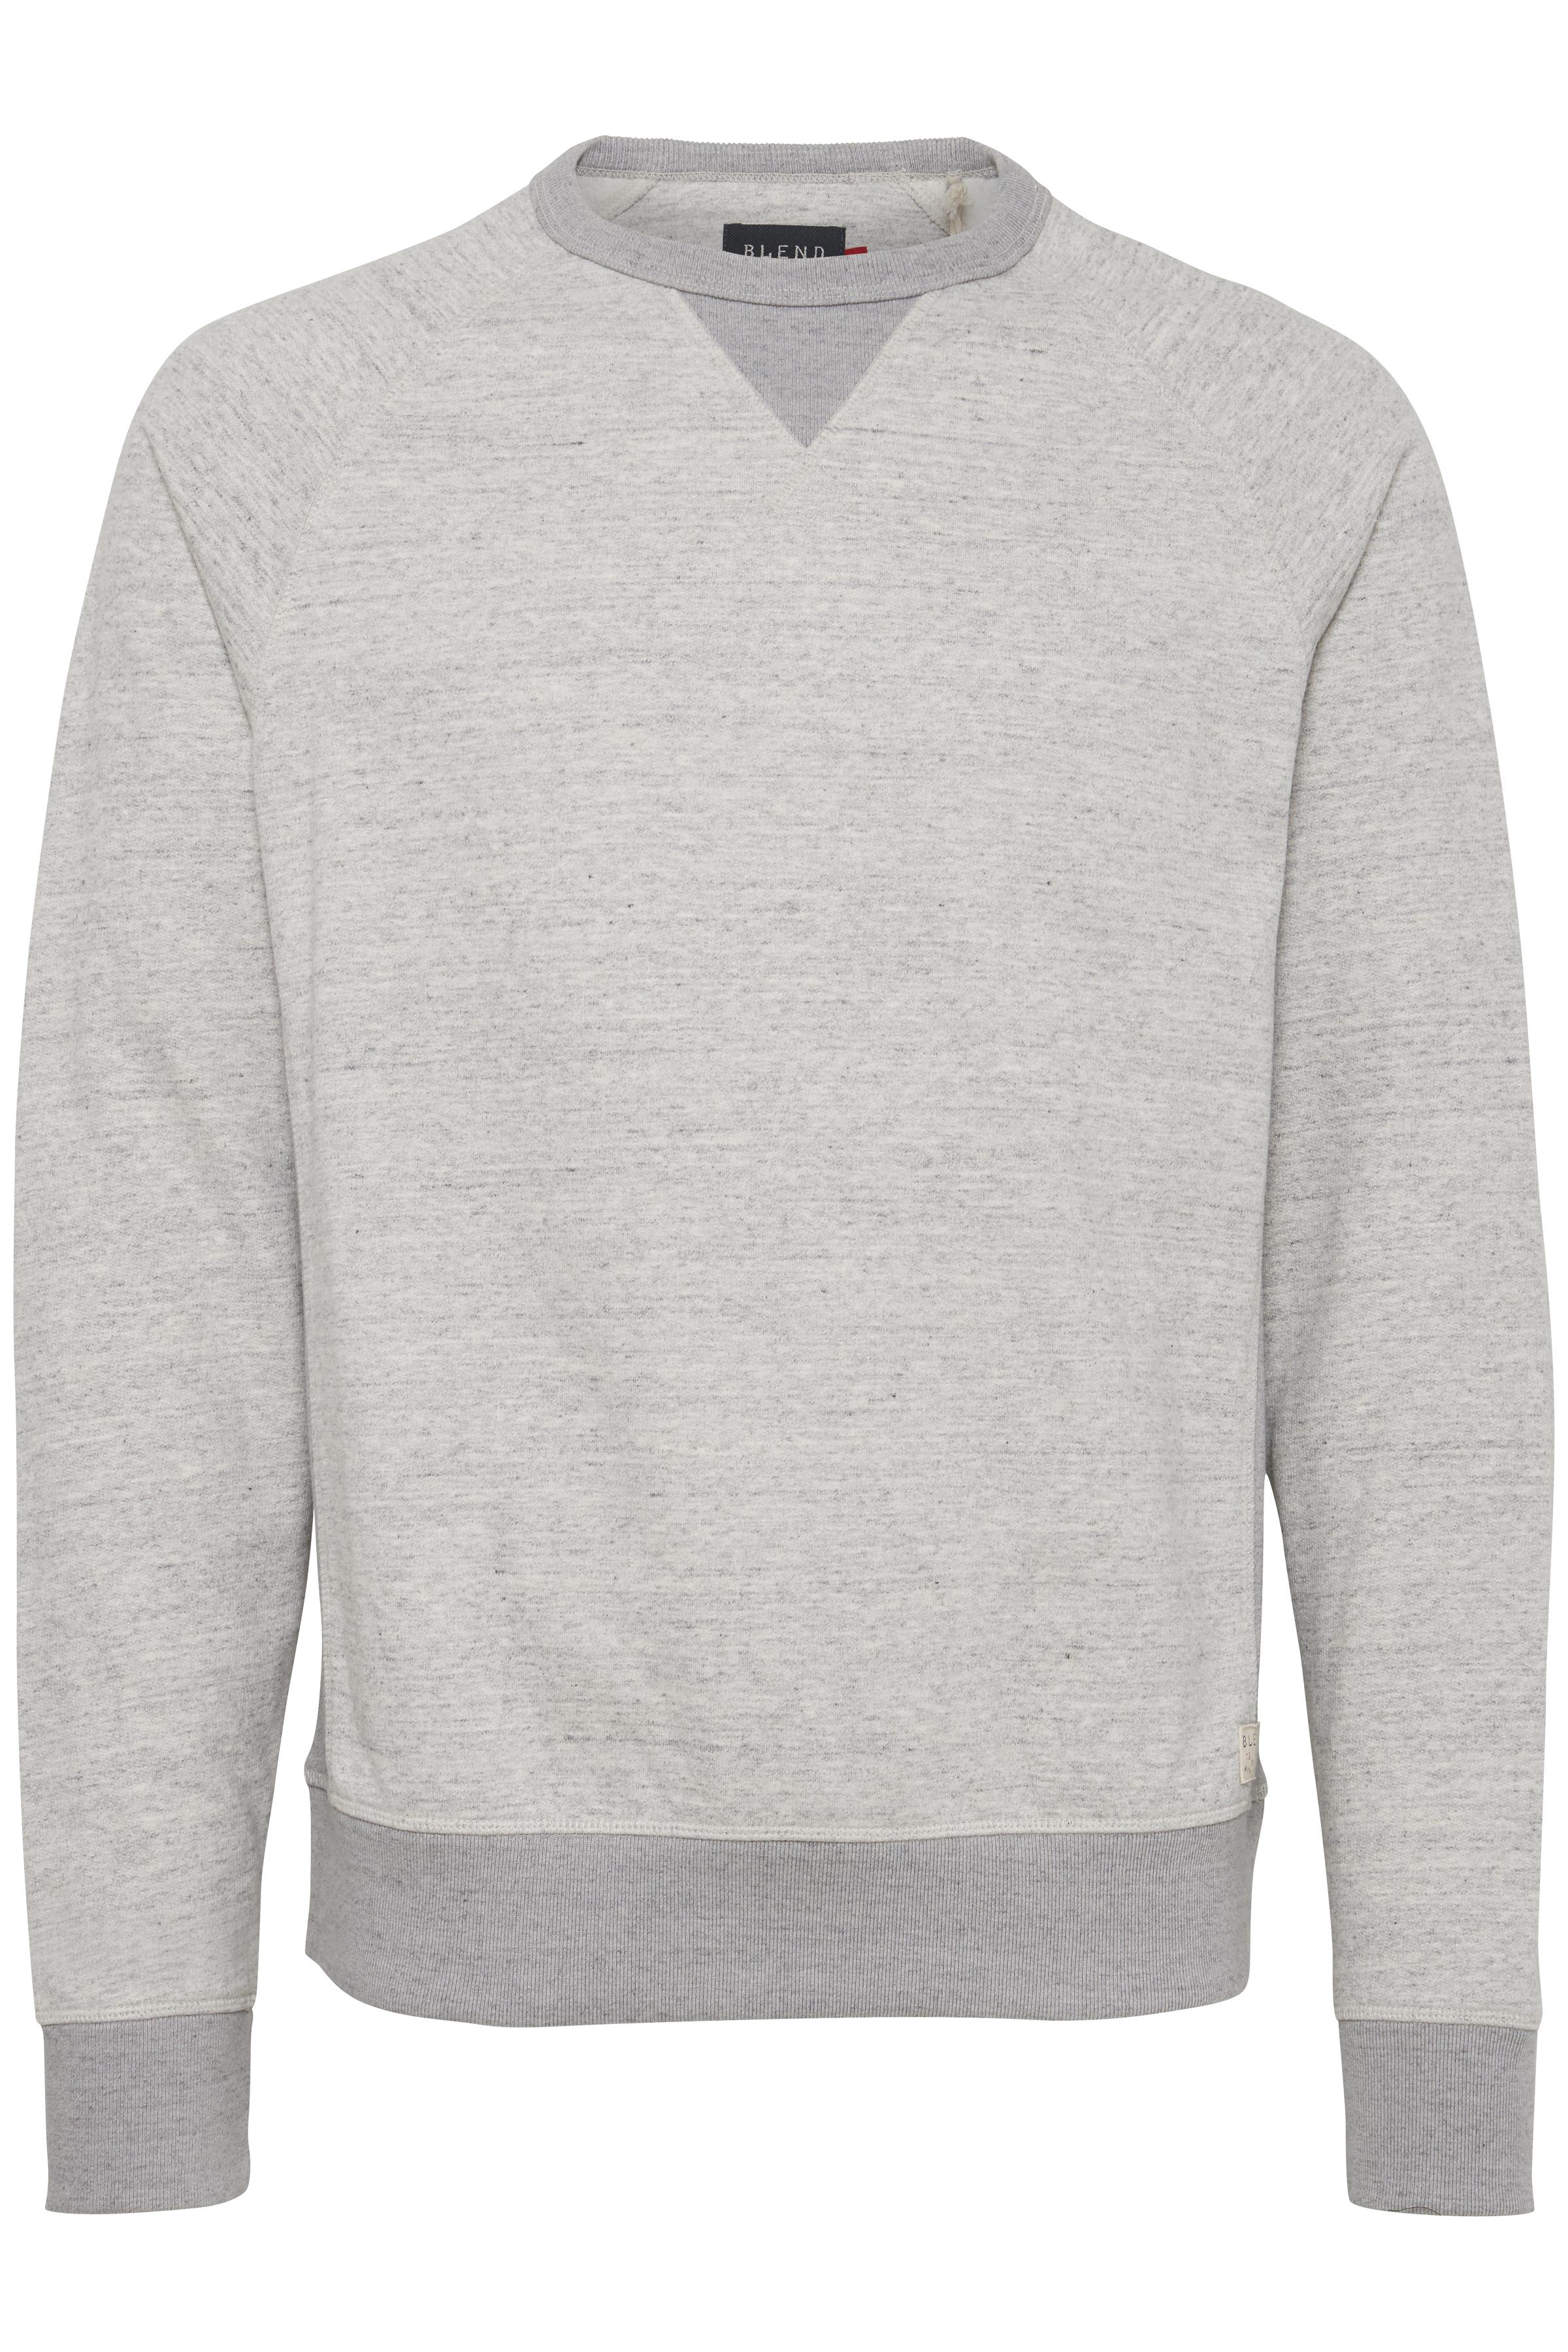 Stone mix Sweatshirt fra Blend He – Køb Stone mix Sweatshirt fra str. S-3XL her